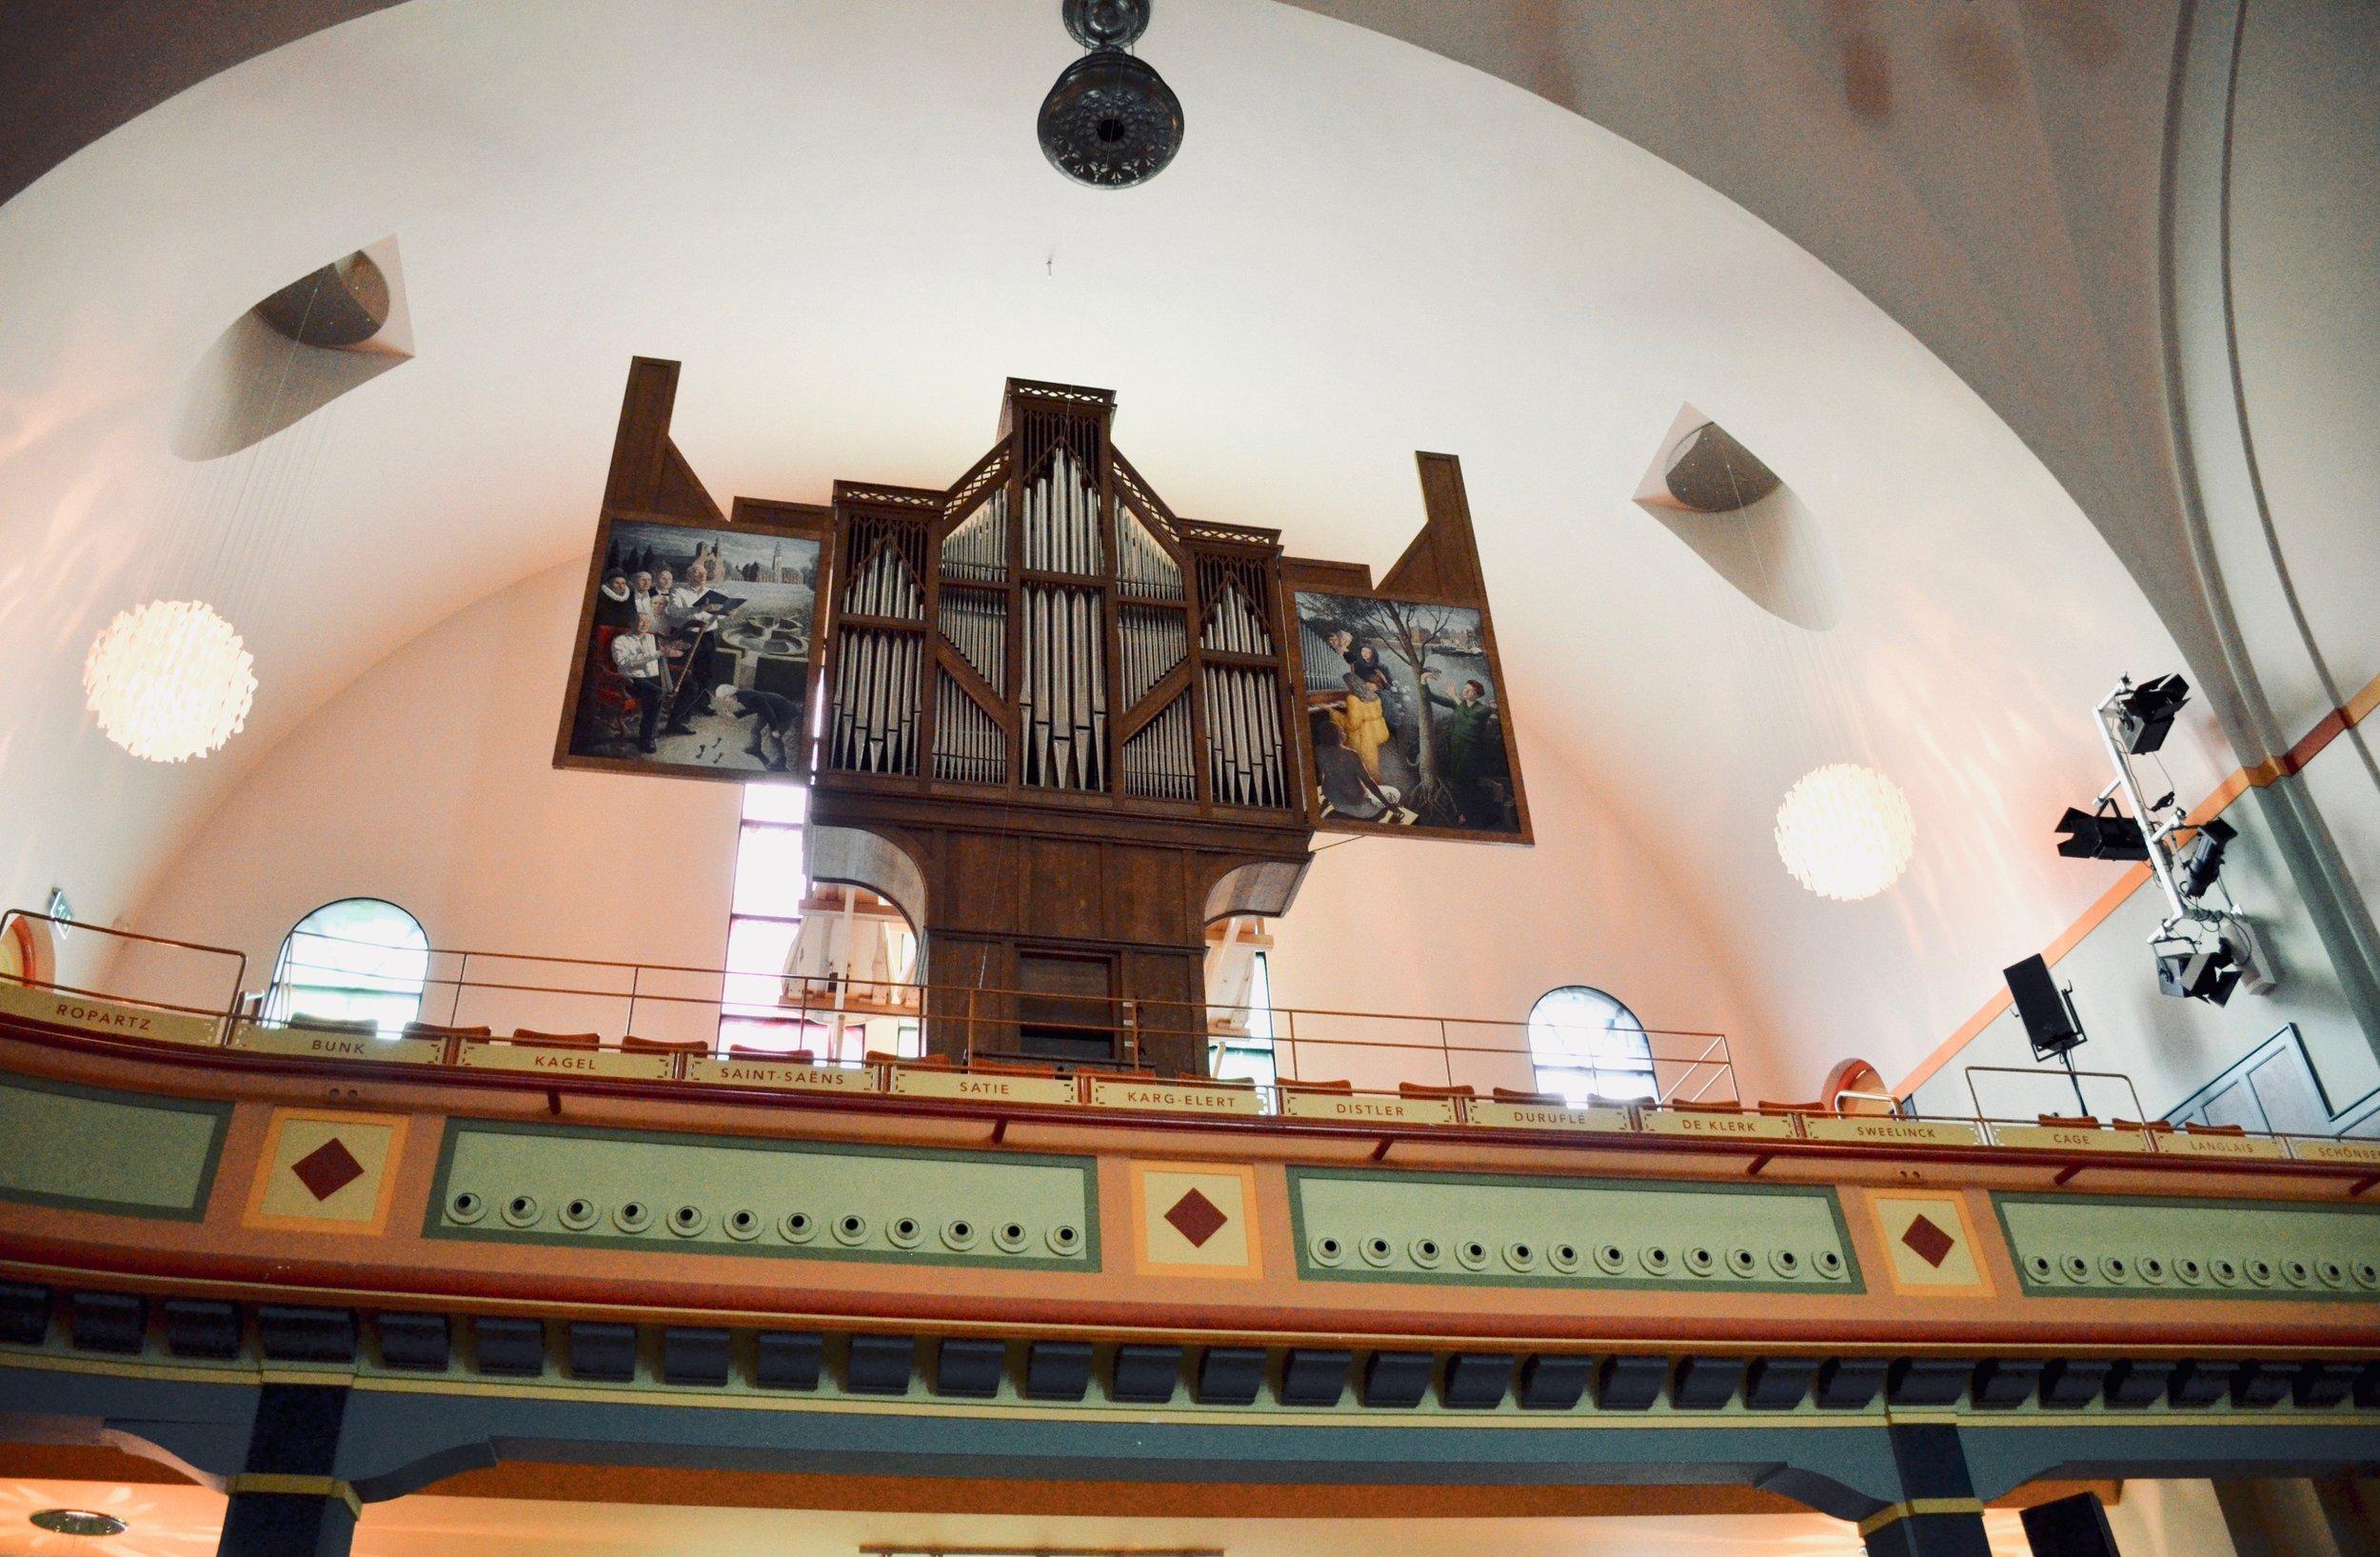 The Van Staten blockwerk organ in Amsterdam.